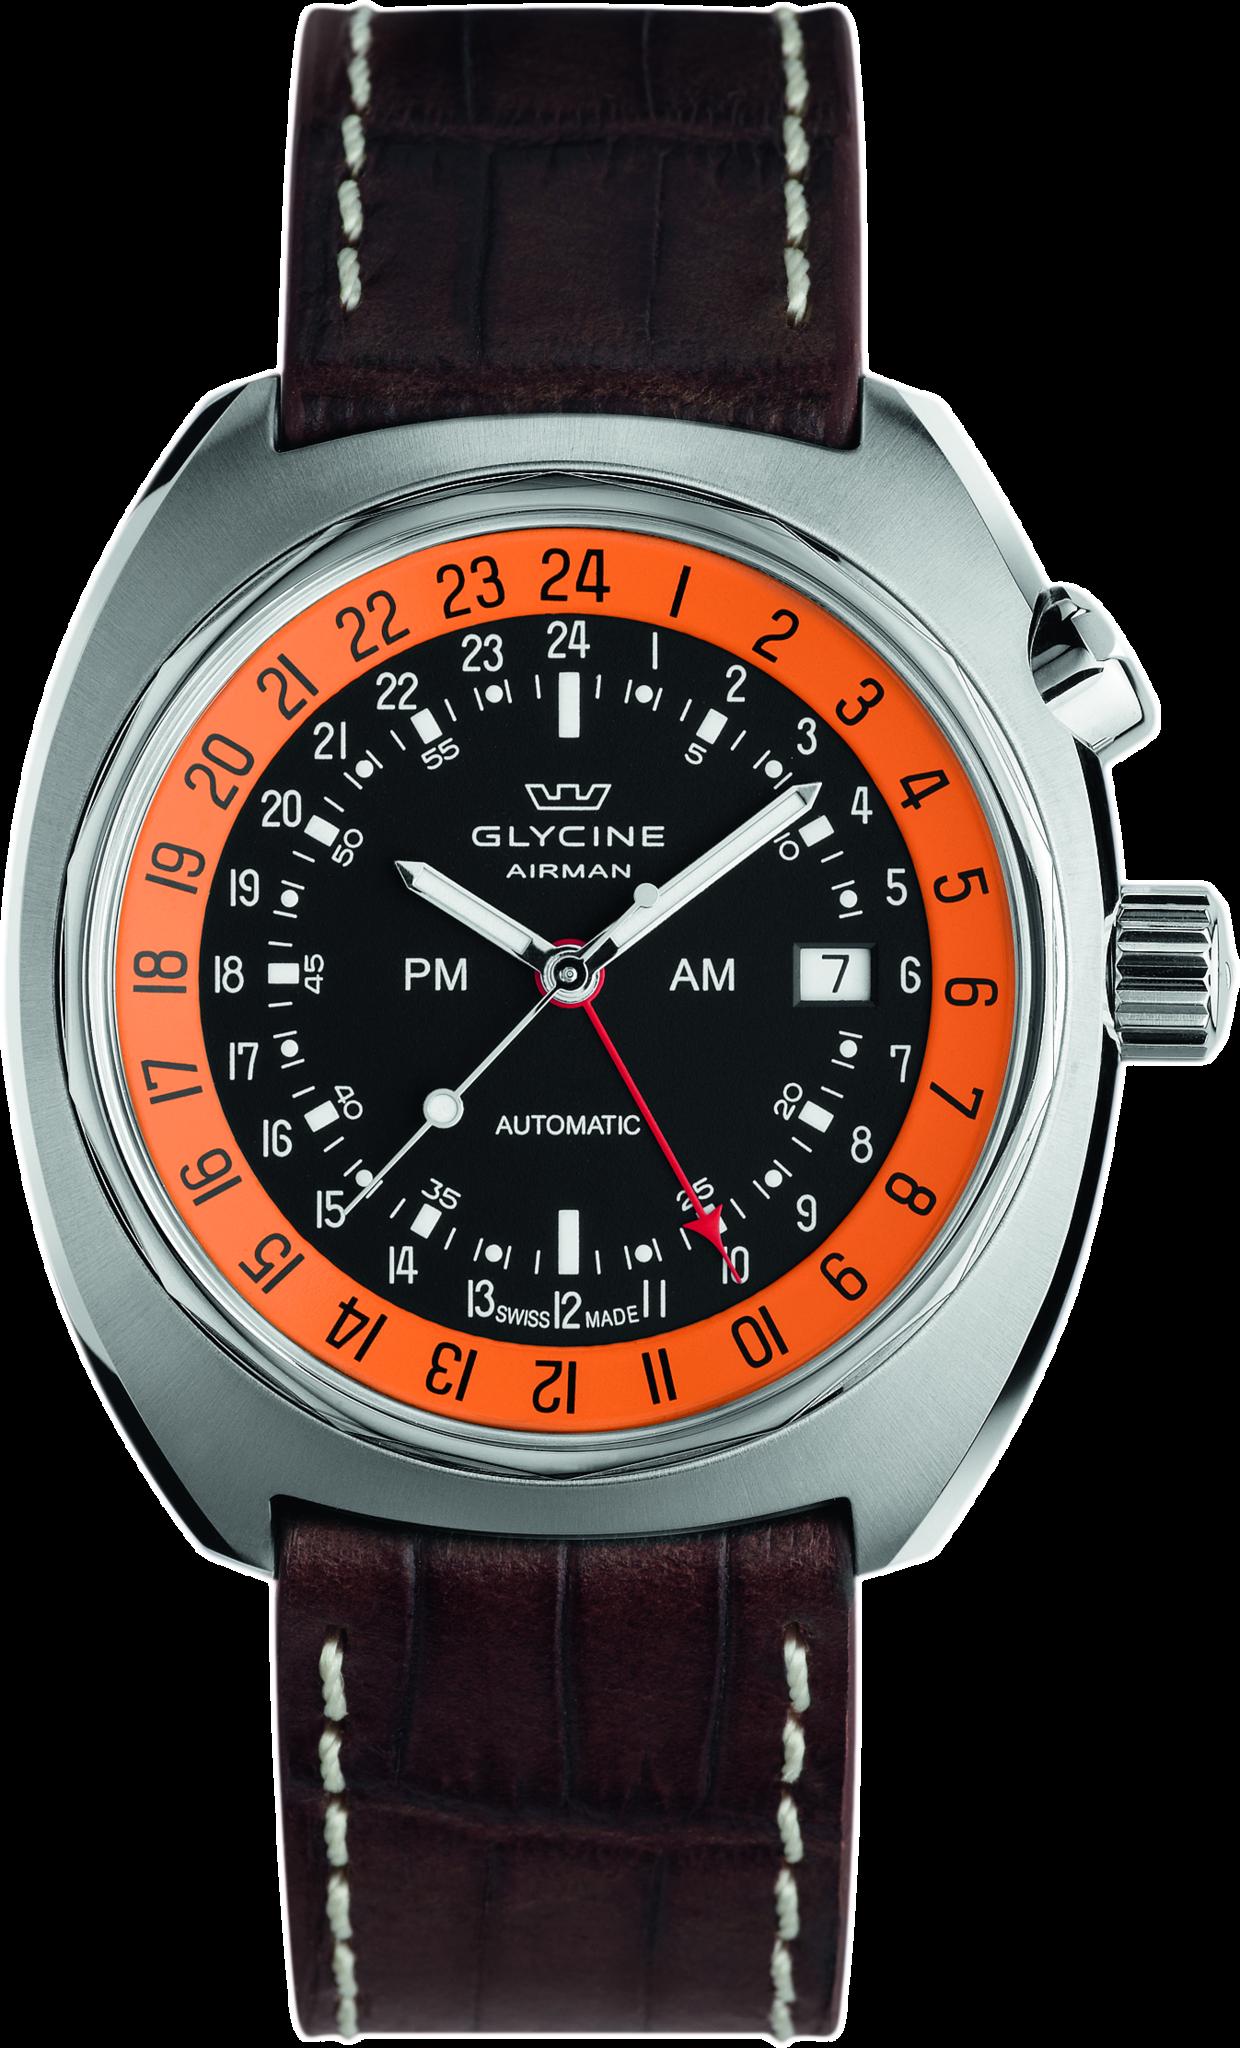 Glycine - Airman SST 12 | Ref. 3903.196 LBN7